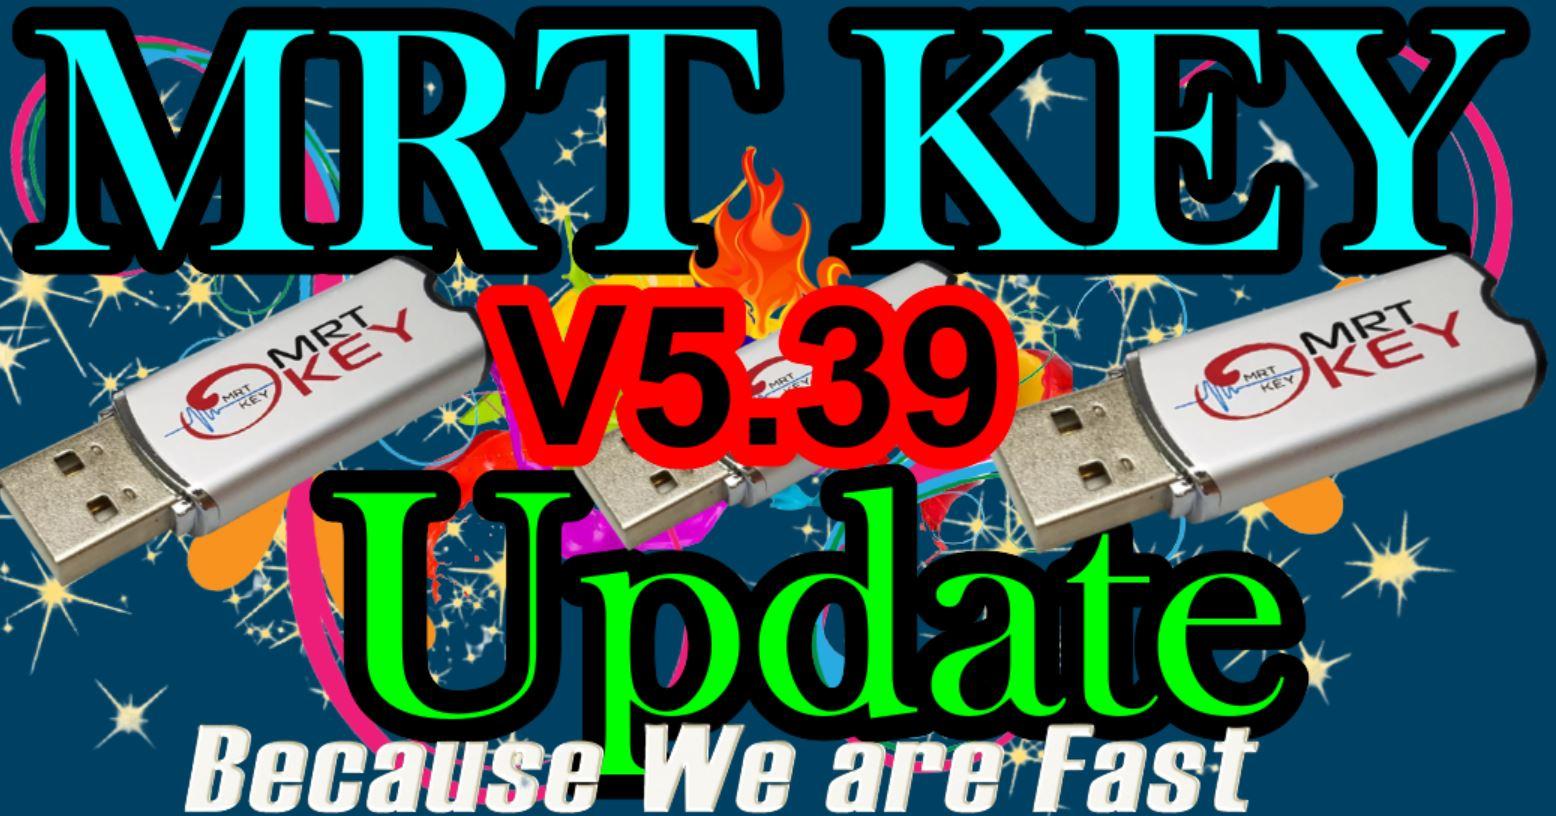 MRT Key V5.39